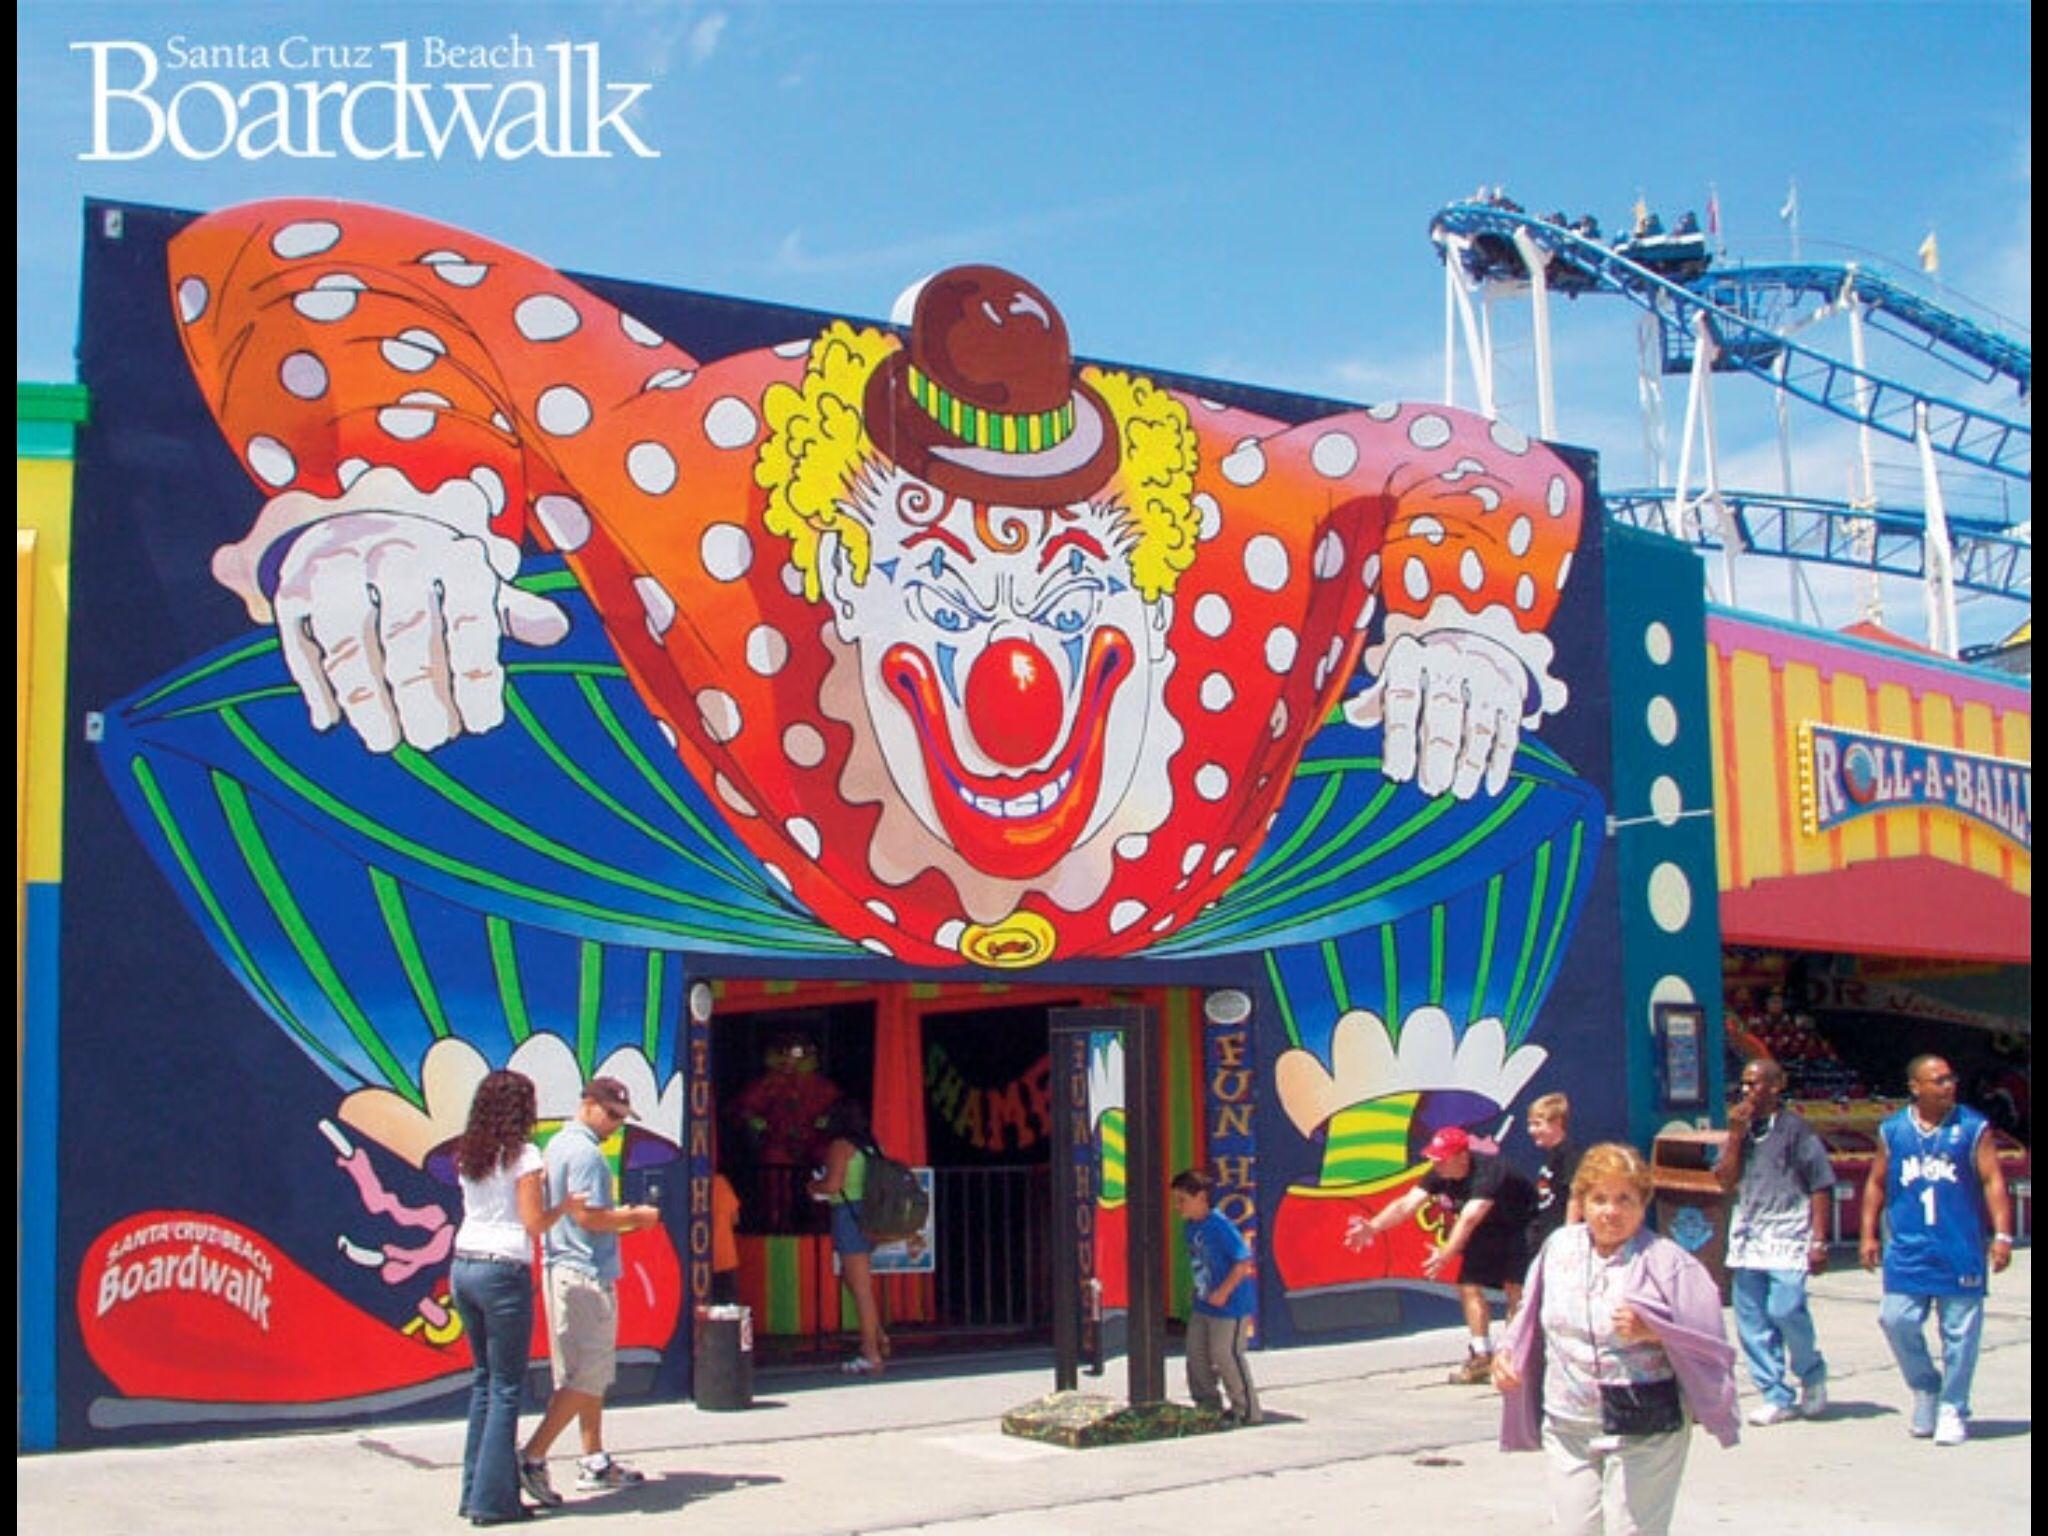 Clown House Santa Cruz Beach Boardwalk Santa Cruz Beach Beach